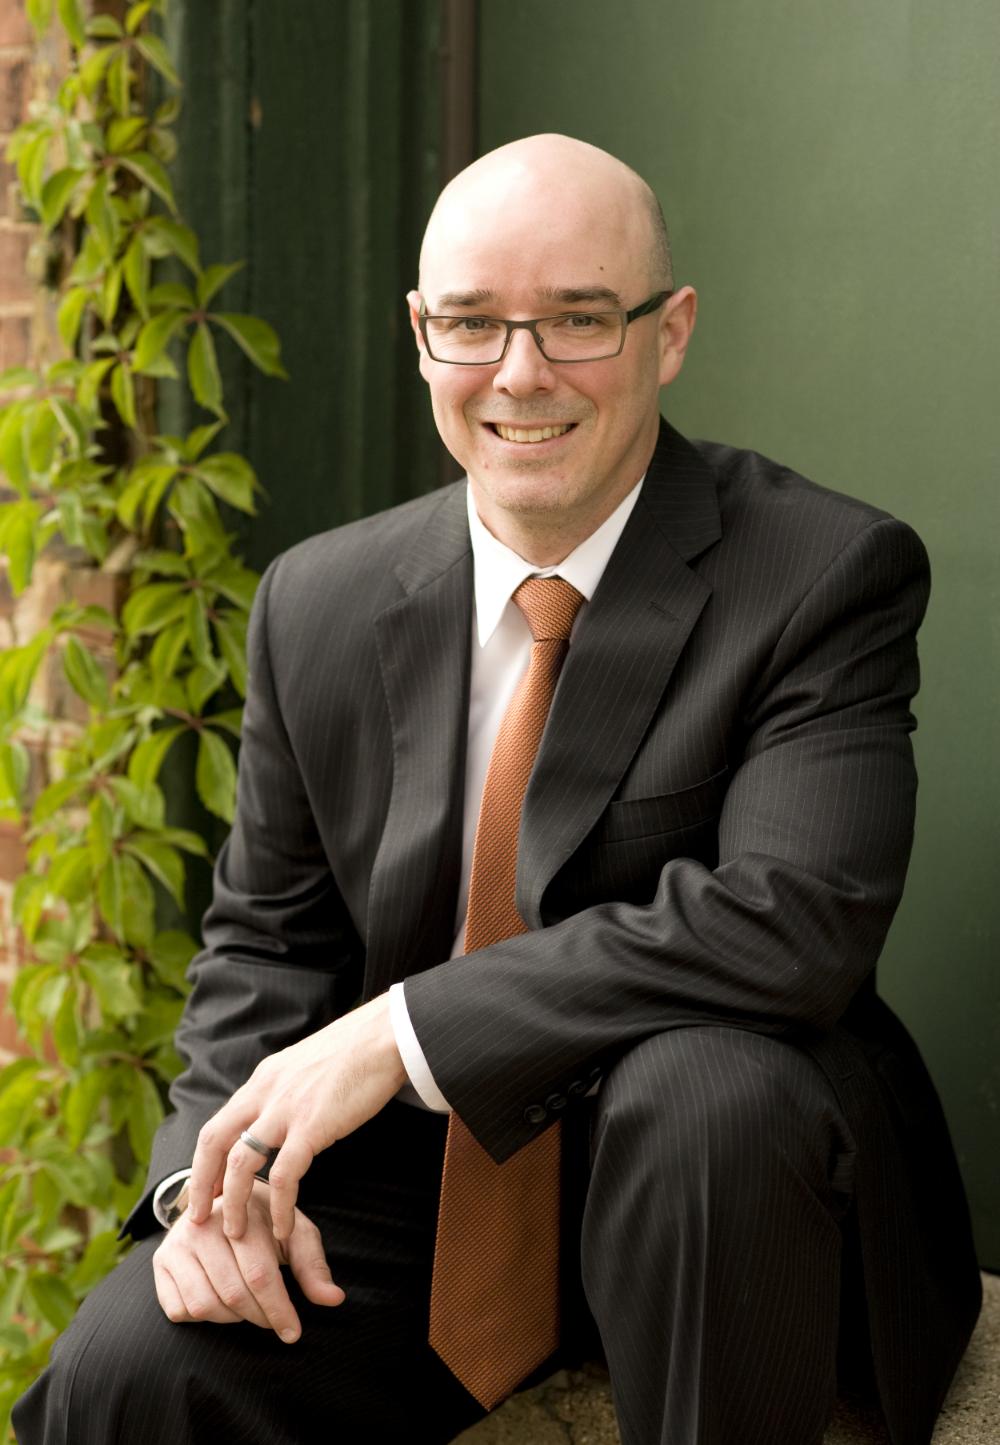 Attorney Andrew M. Wright